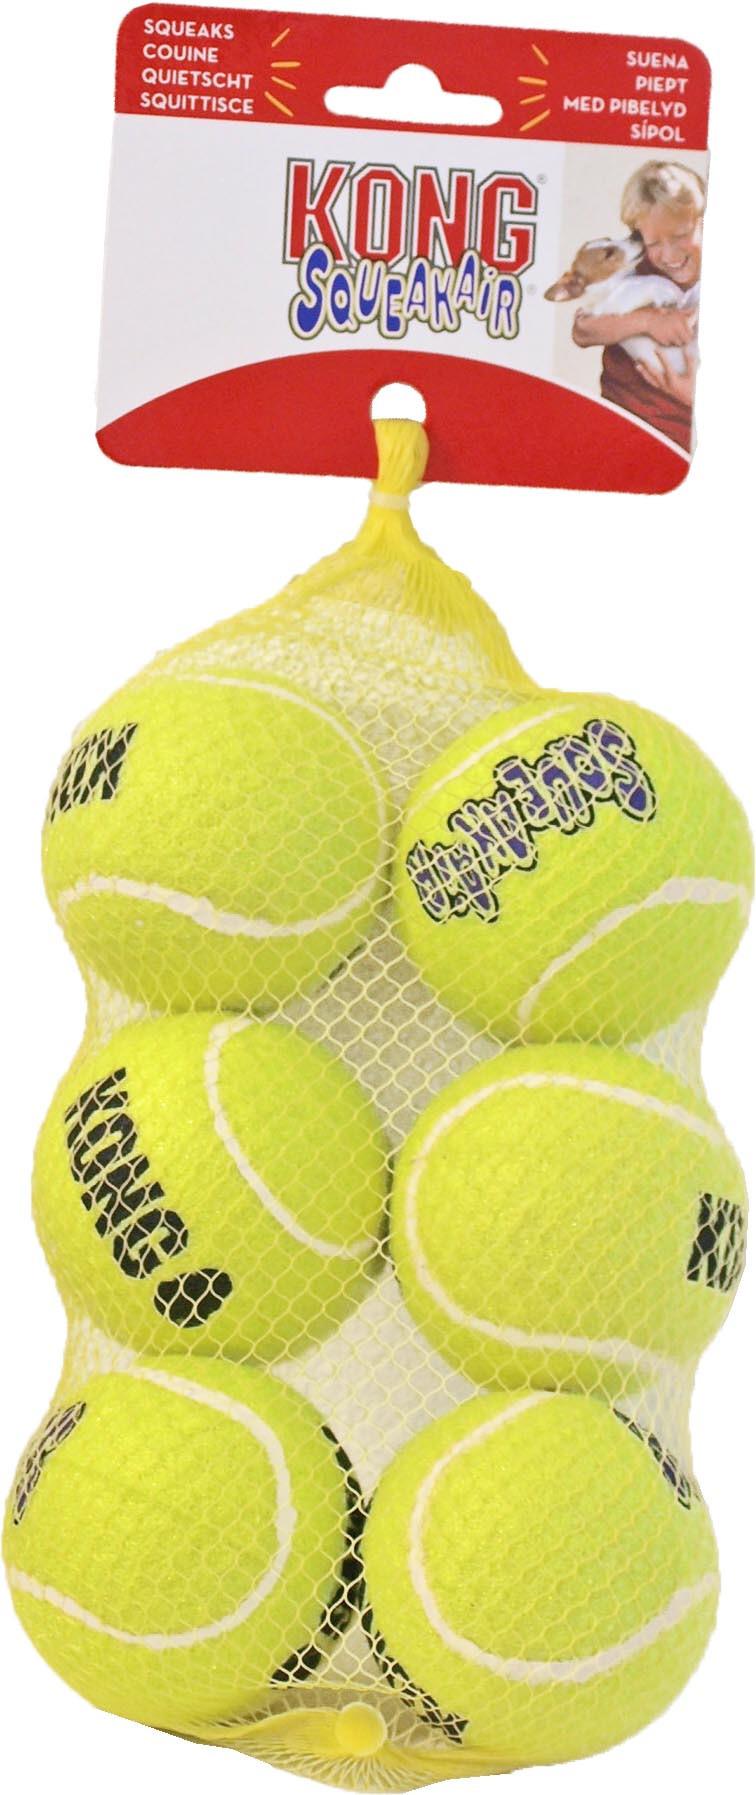 Kong AirDog Squeakair tennisbal M 6 st